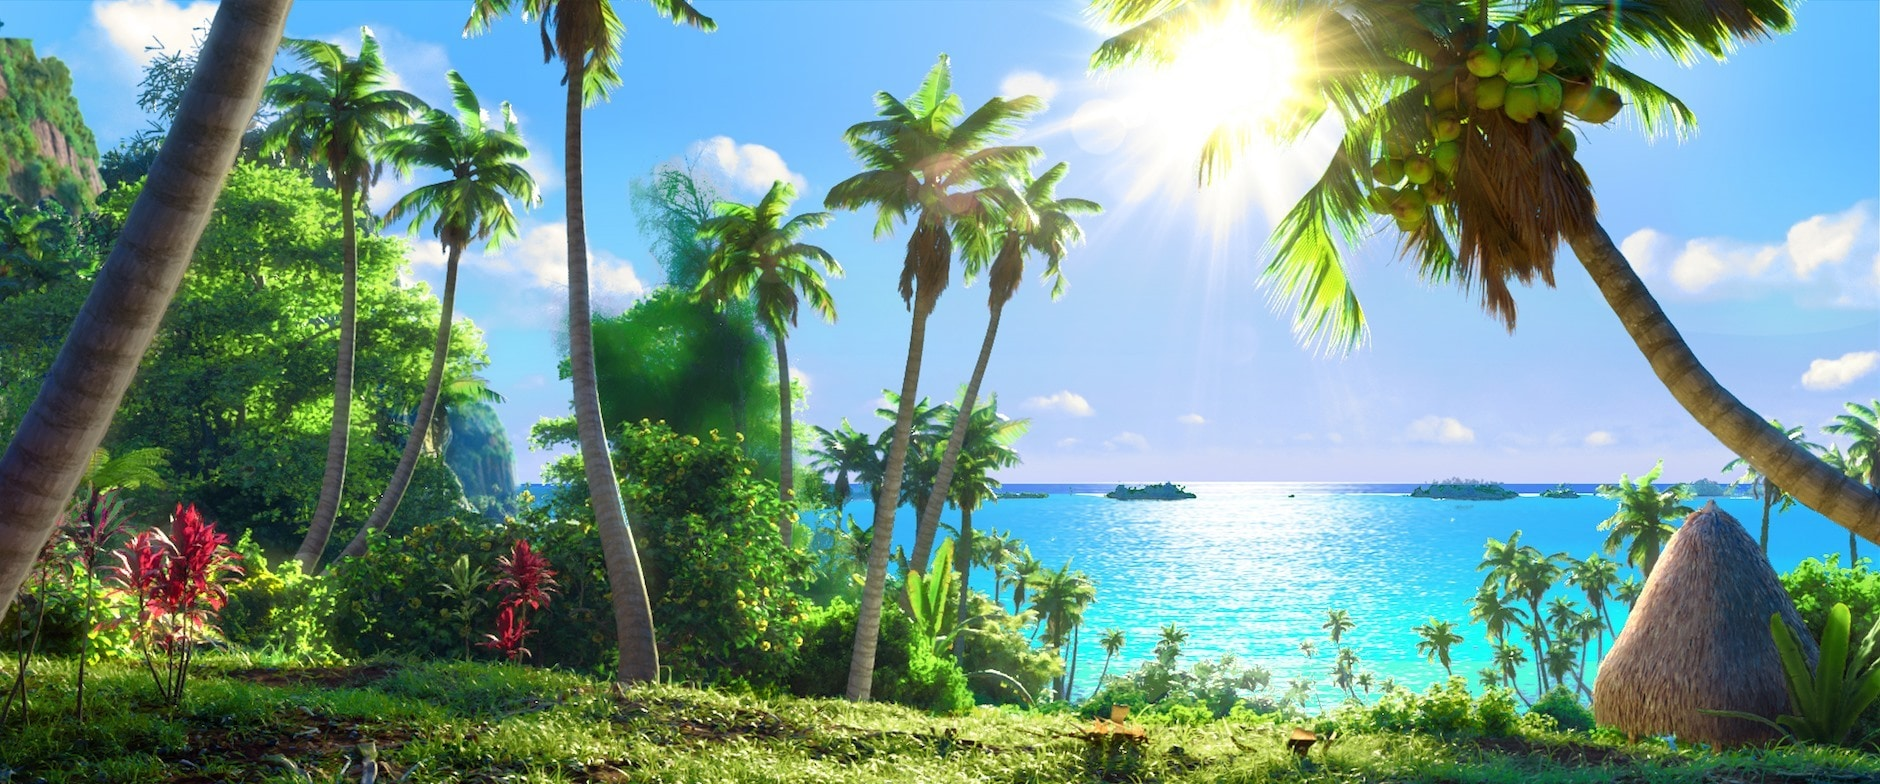 island of motonui from Moana